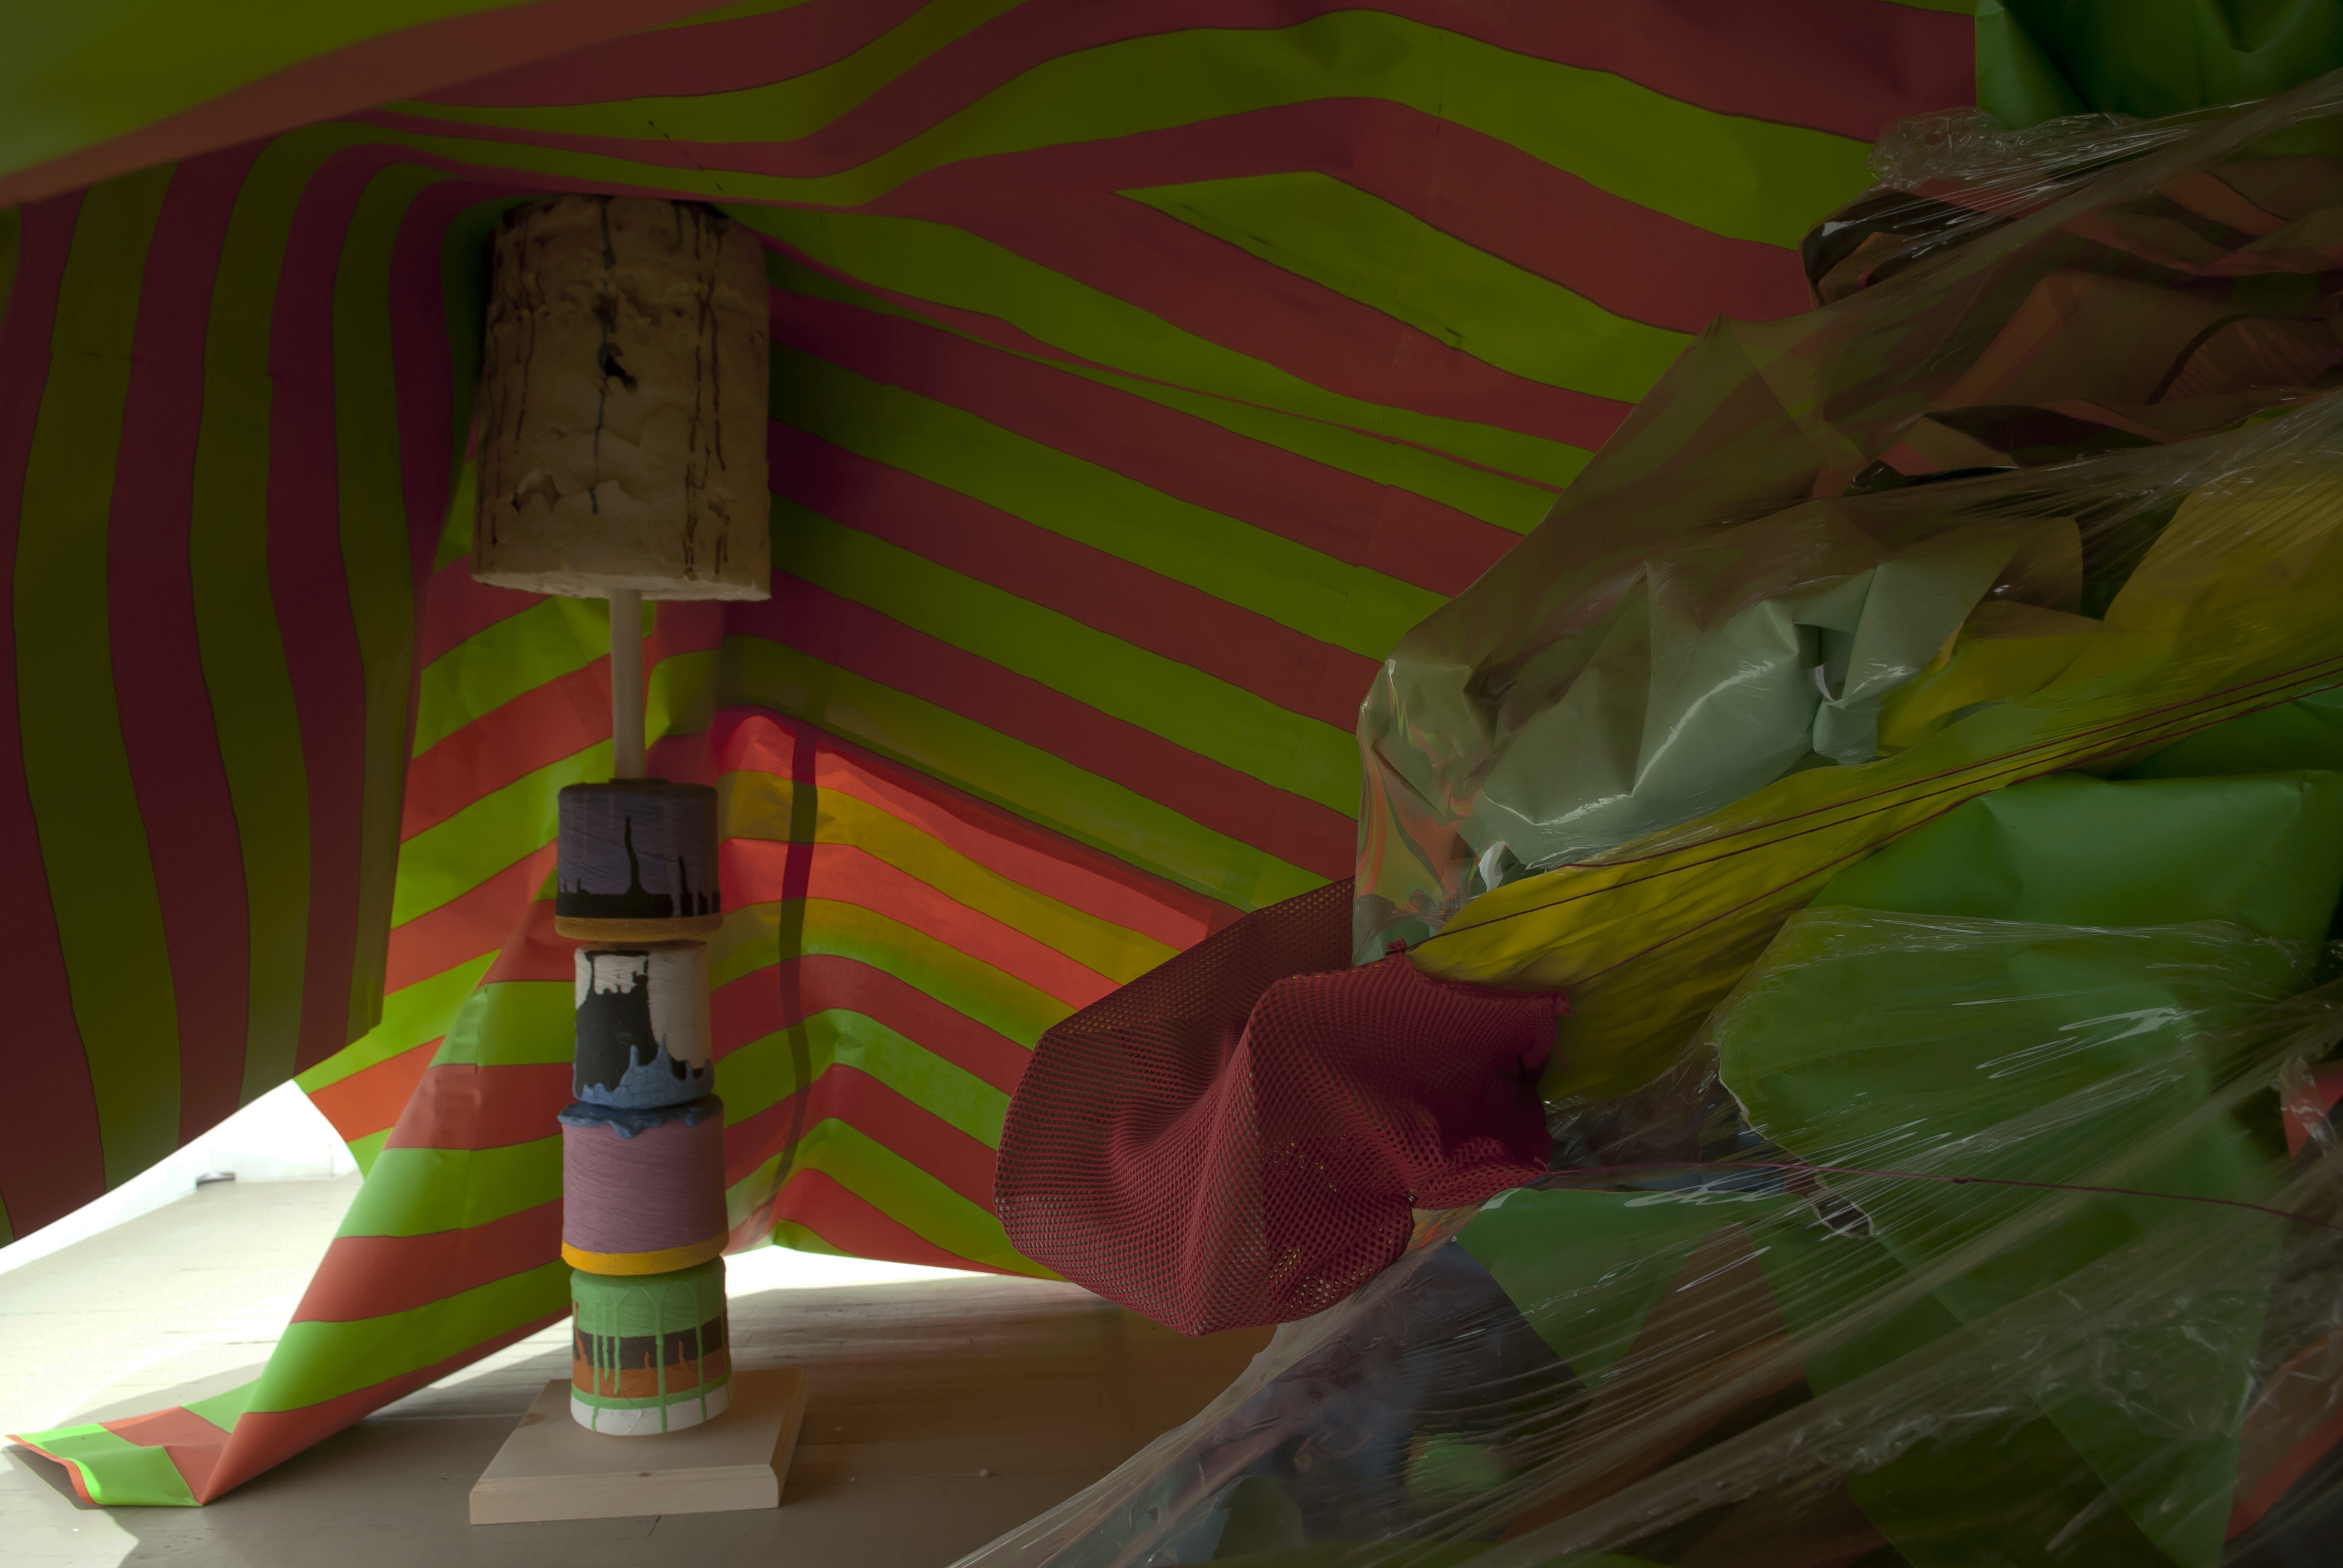 Séripop, This Peculiar Bias Will Nonetheless Set Up A Vast Field For The Unforeseen, 2013, Papier sérigraphié, bois, chaises, tabouret, rochets, mousse polyuréthane, gouache, serre-joints, film de PVC, tissu, corde, caoutchouc, Screen printed paper, wood, chairs, stool, spools, polyurethane foam, tempera, c-clamps, PVC shrink wrap, fabric, rope, rubber (photo : Éliane Excoffier)